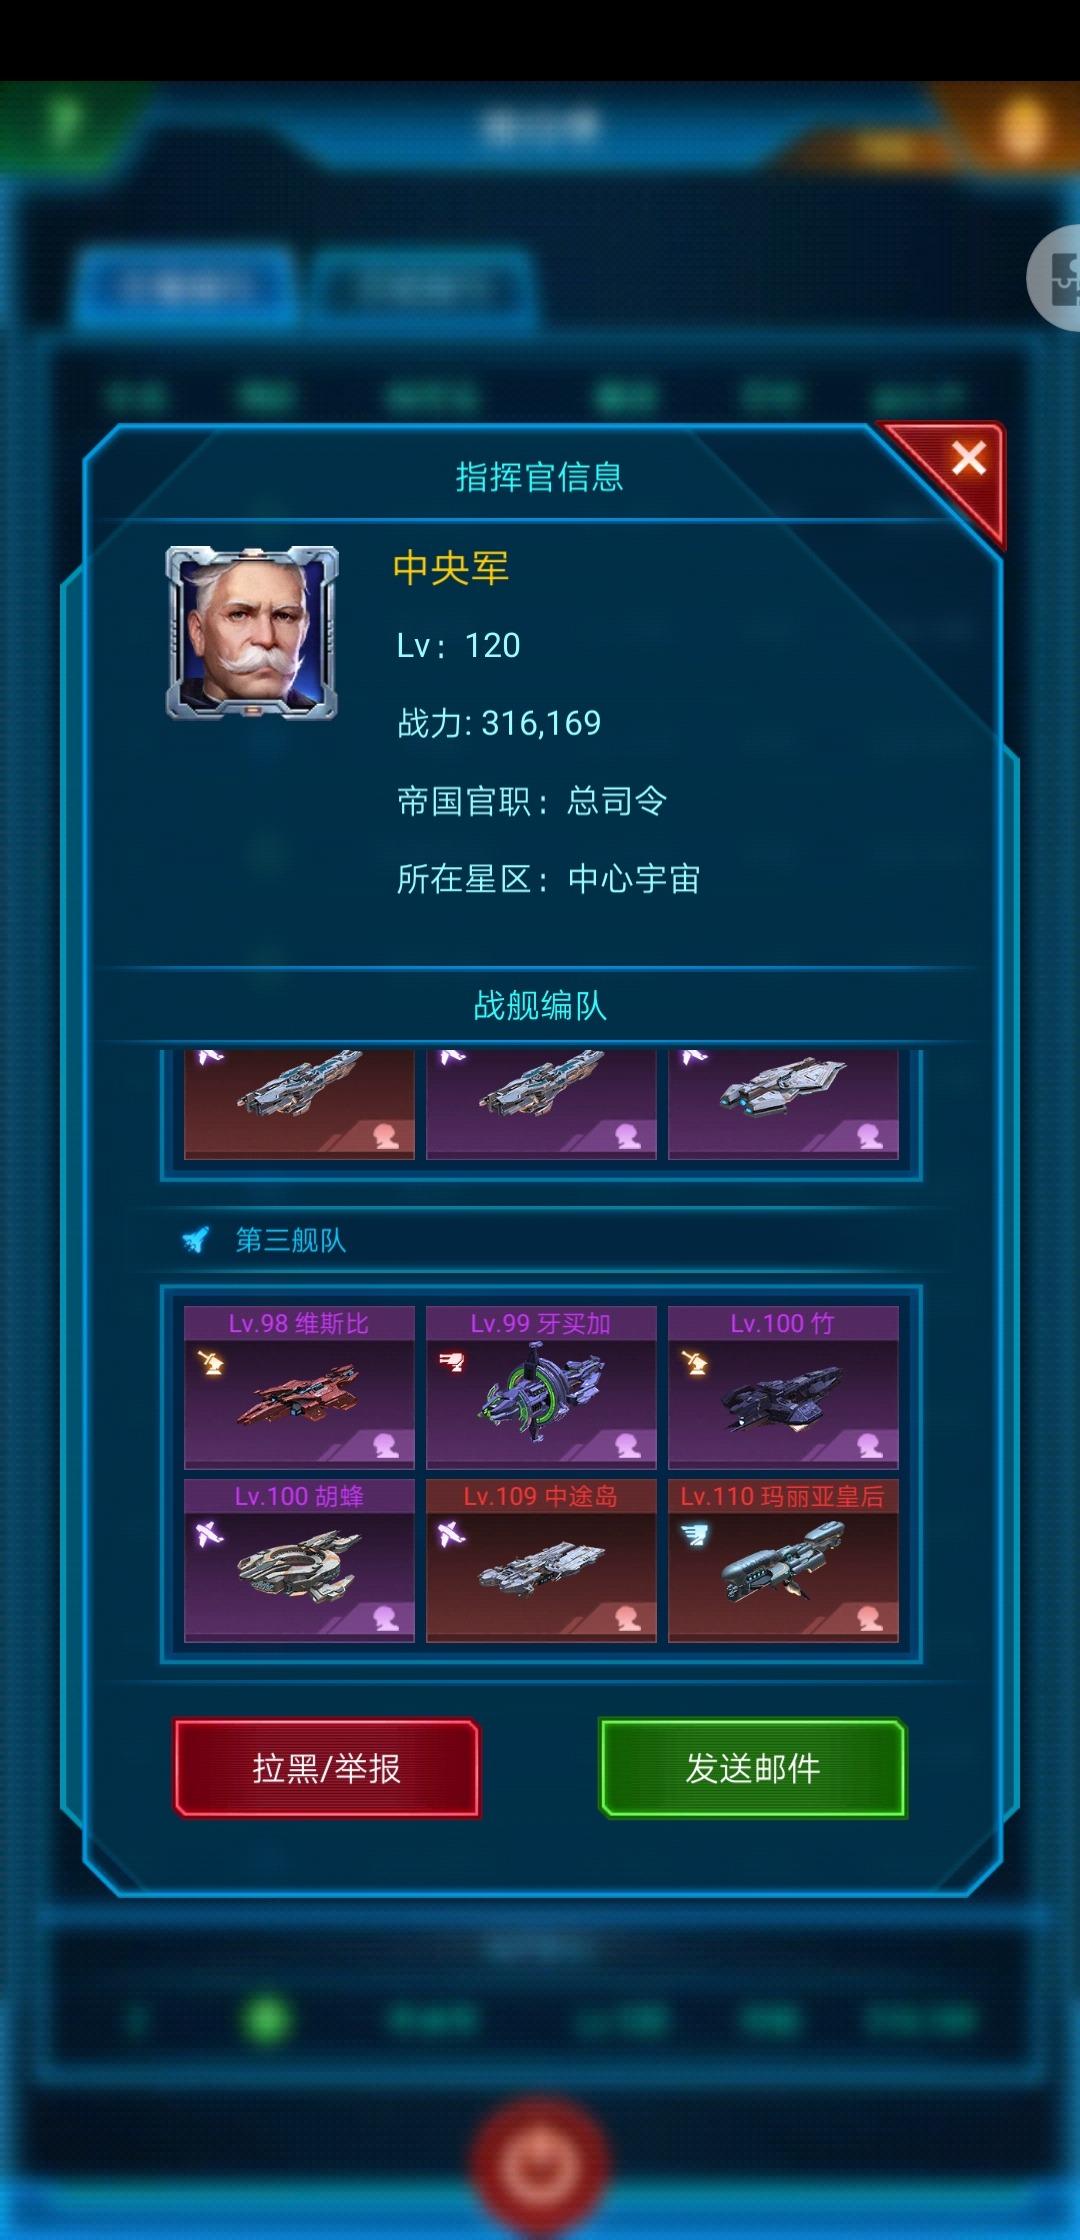 Screenshot_20190614_074046_com.jedigames.p16s.huawei.jpg